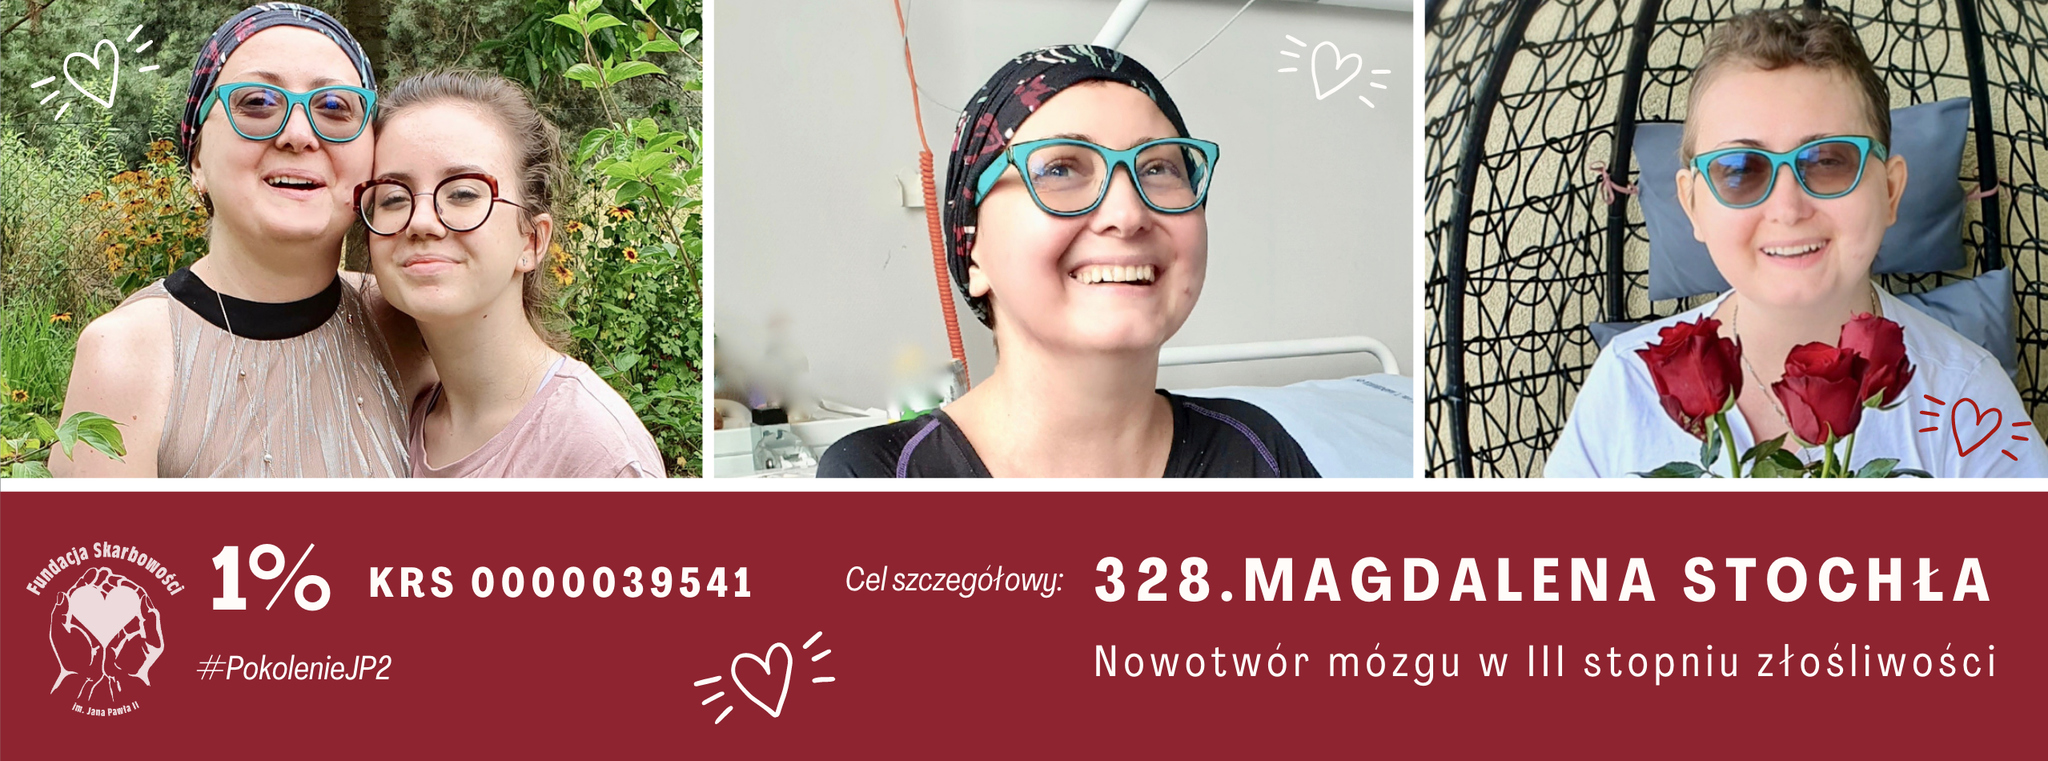 328.MagdalenaStochła_Easy-Resize.com